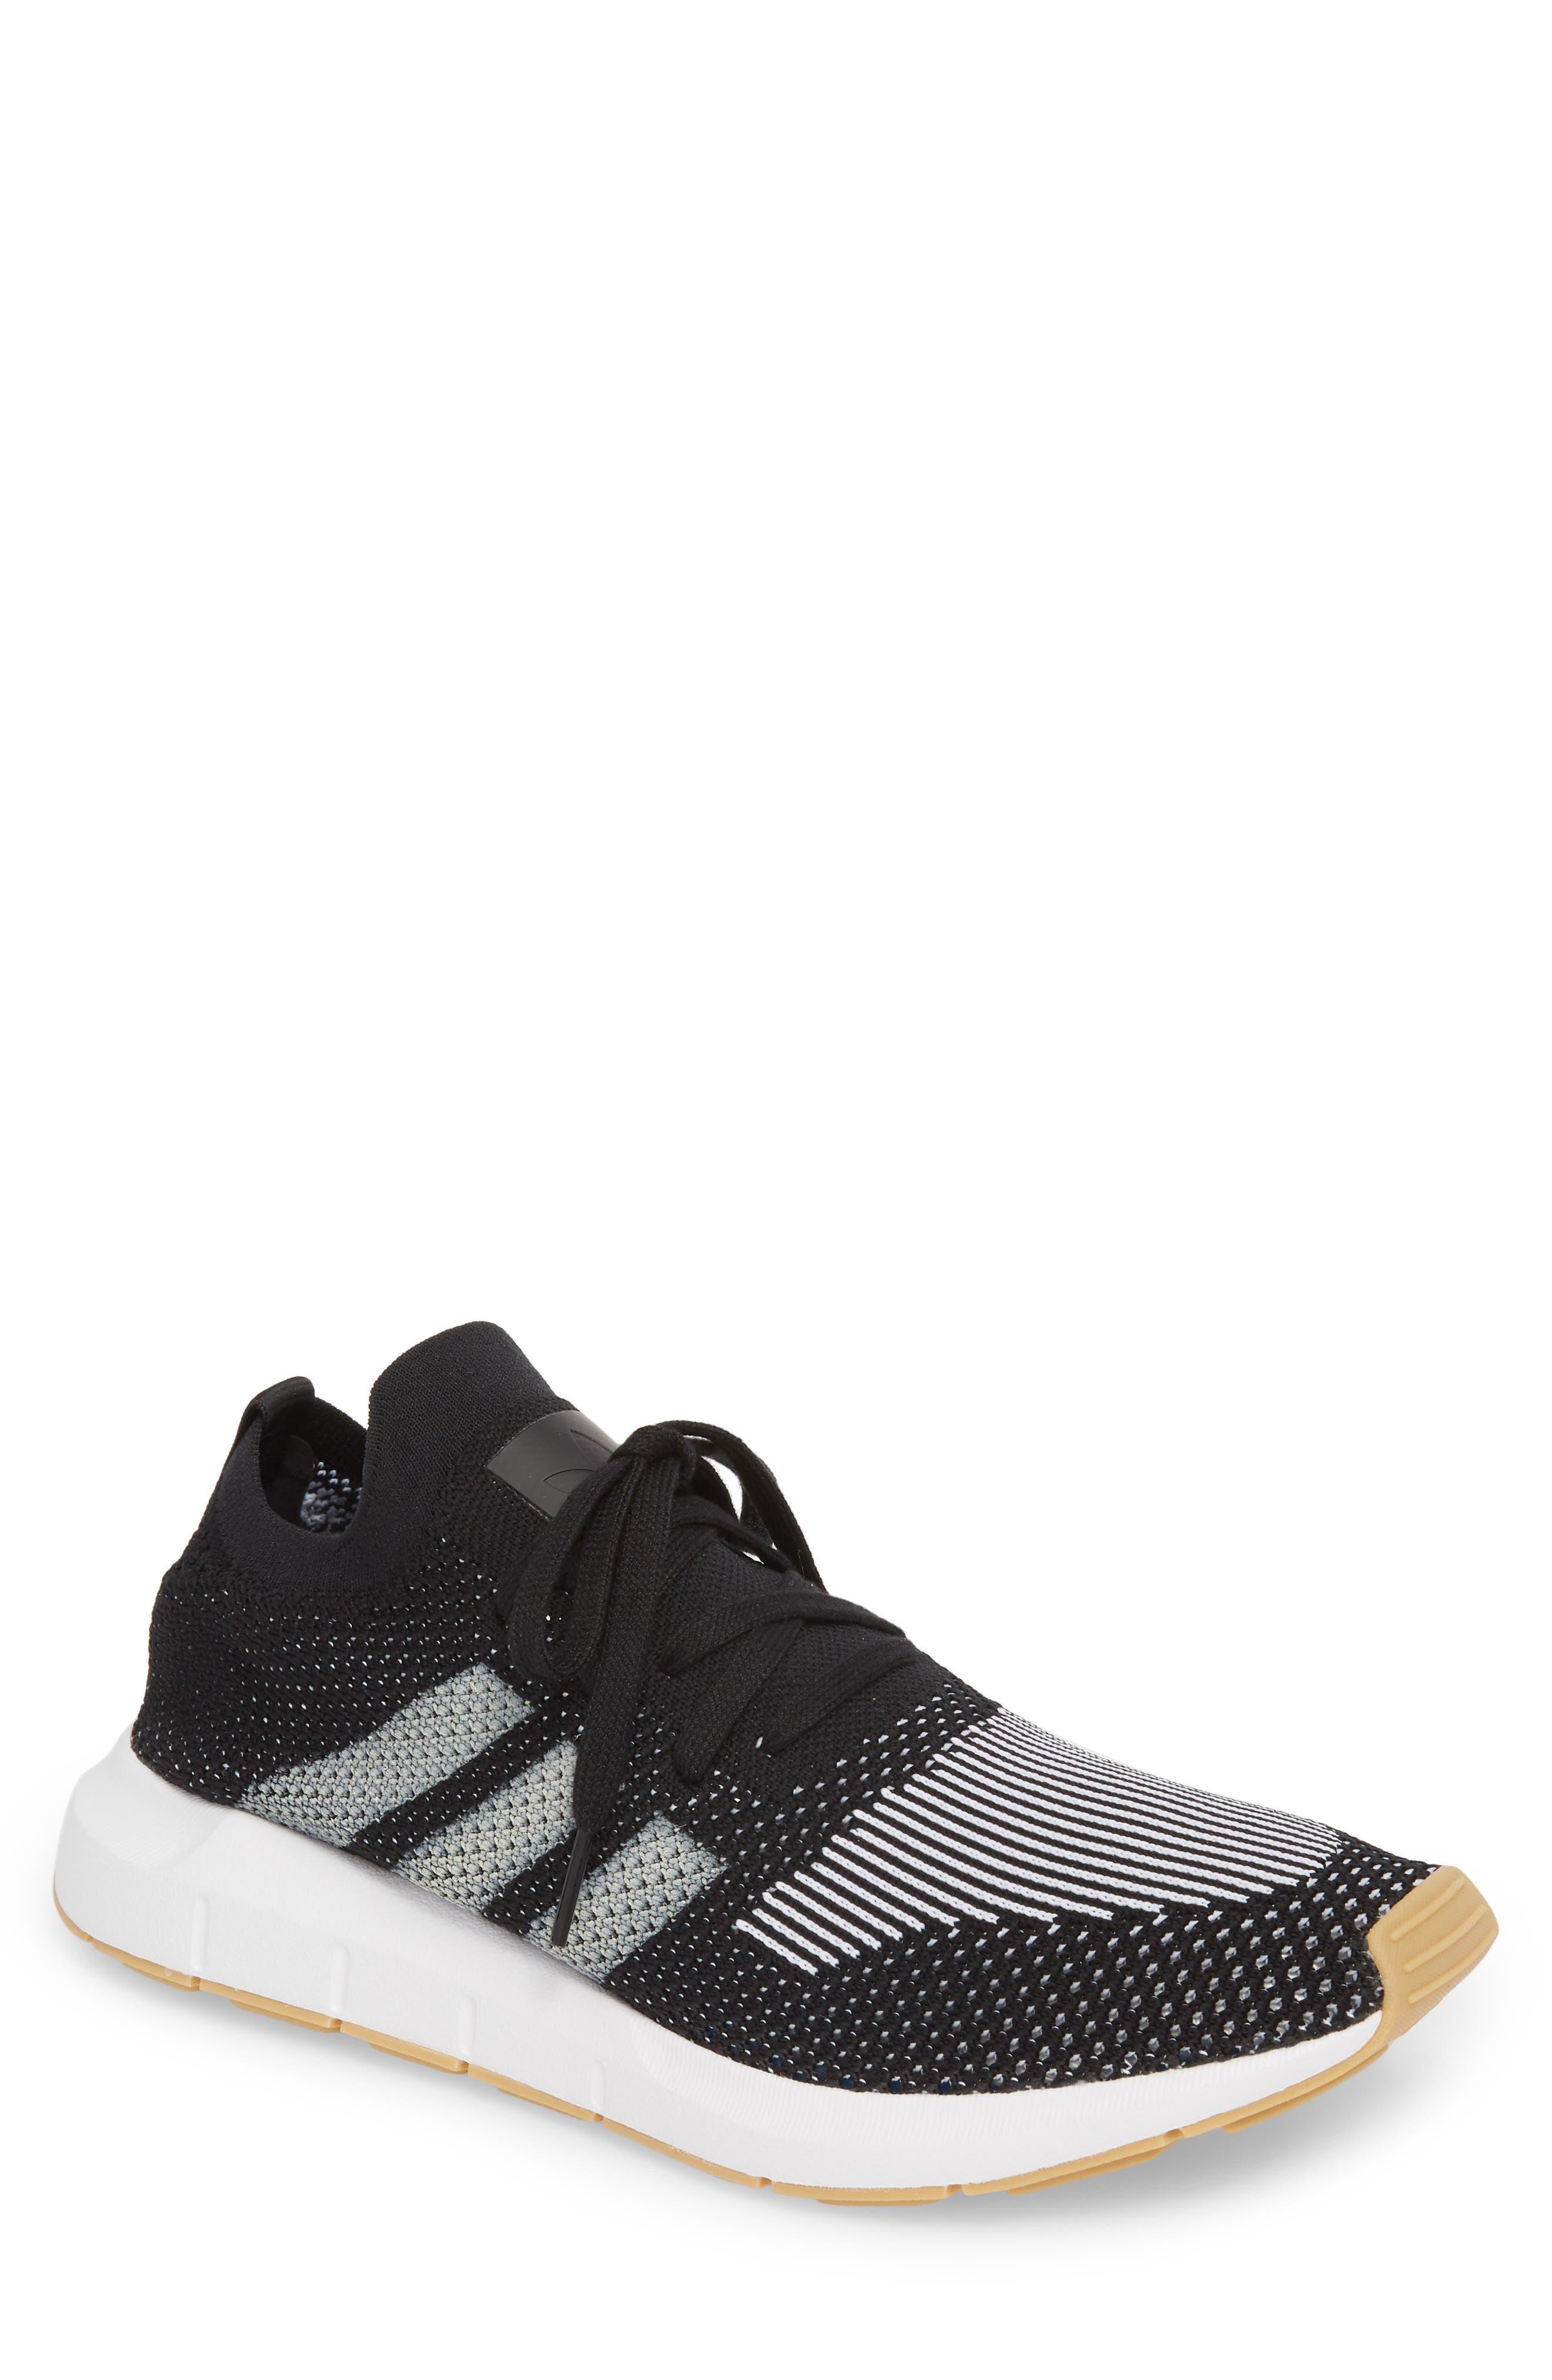 Swift Run Primeknit Sneaker,                             Main thumbnail 1, color,                             001